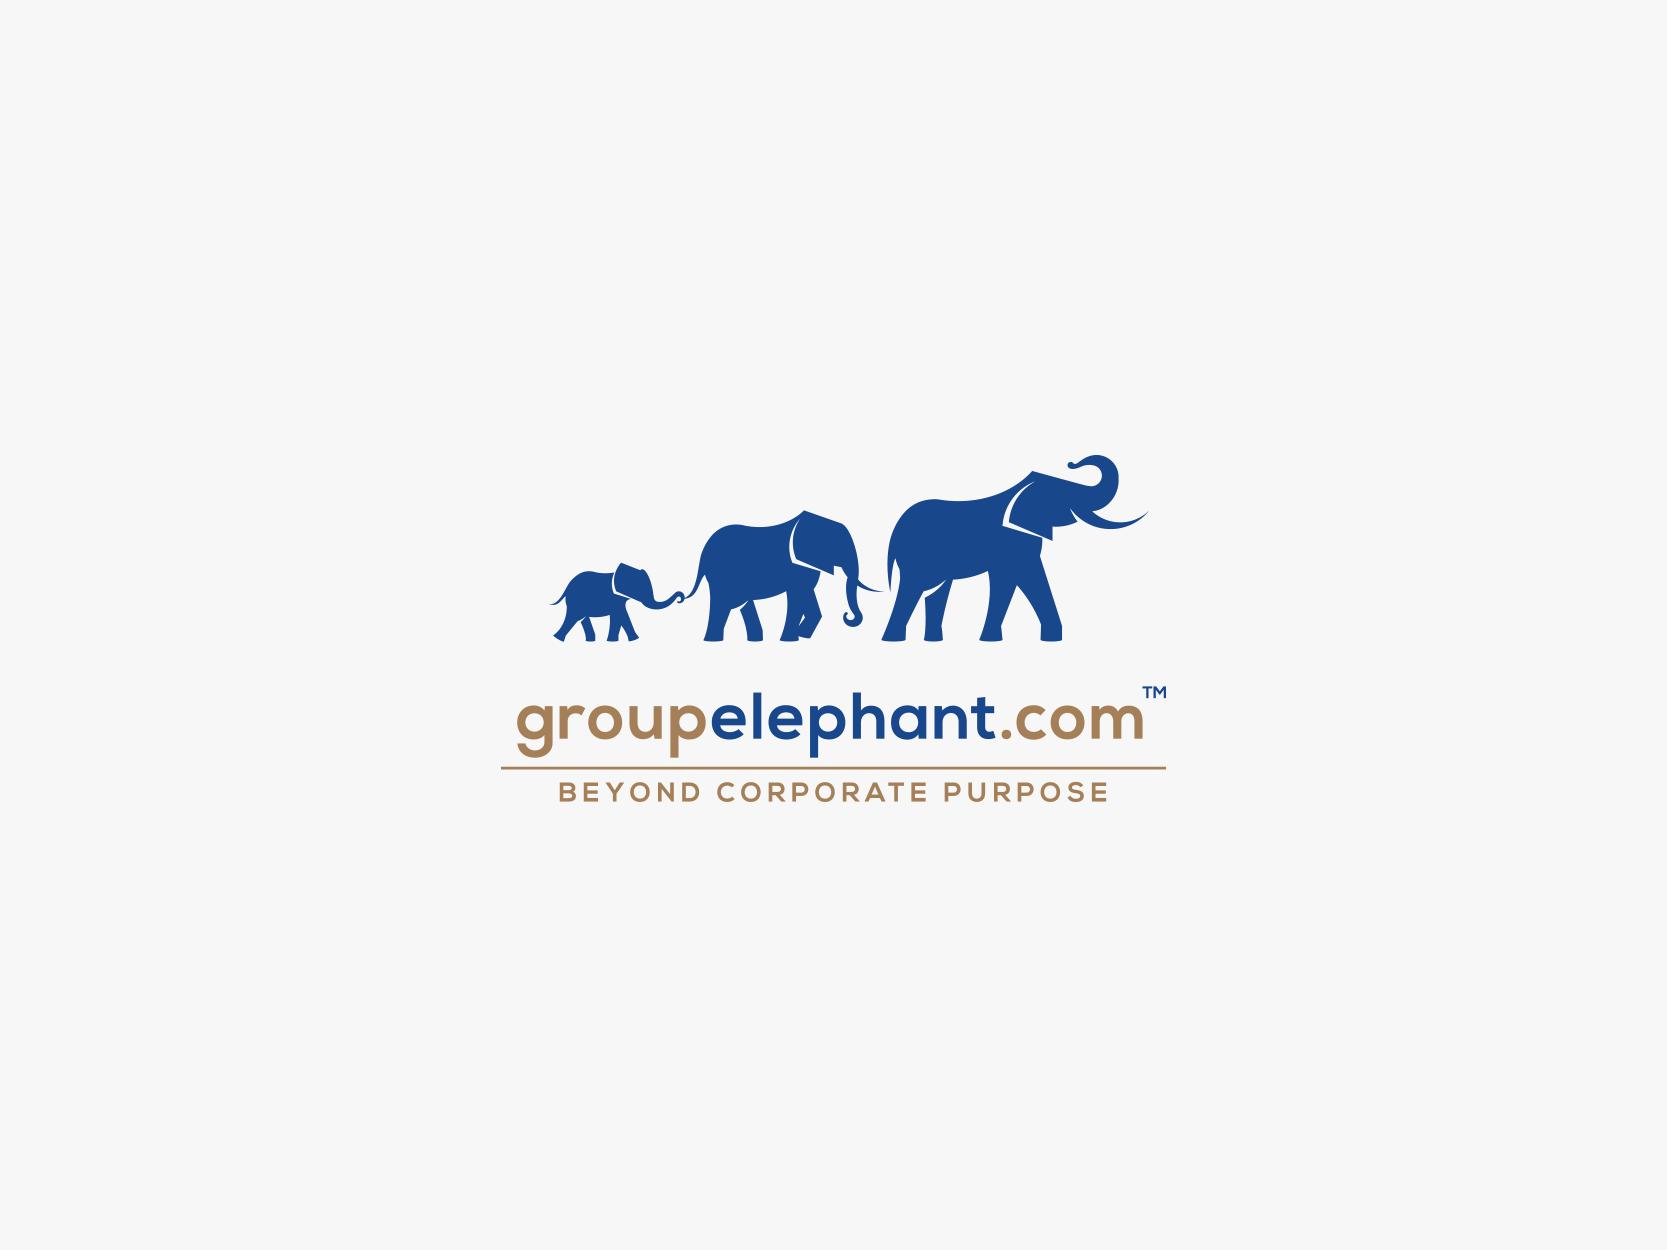 Groupelephant.png